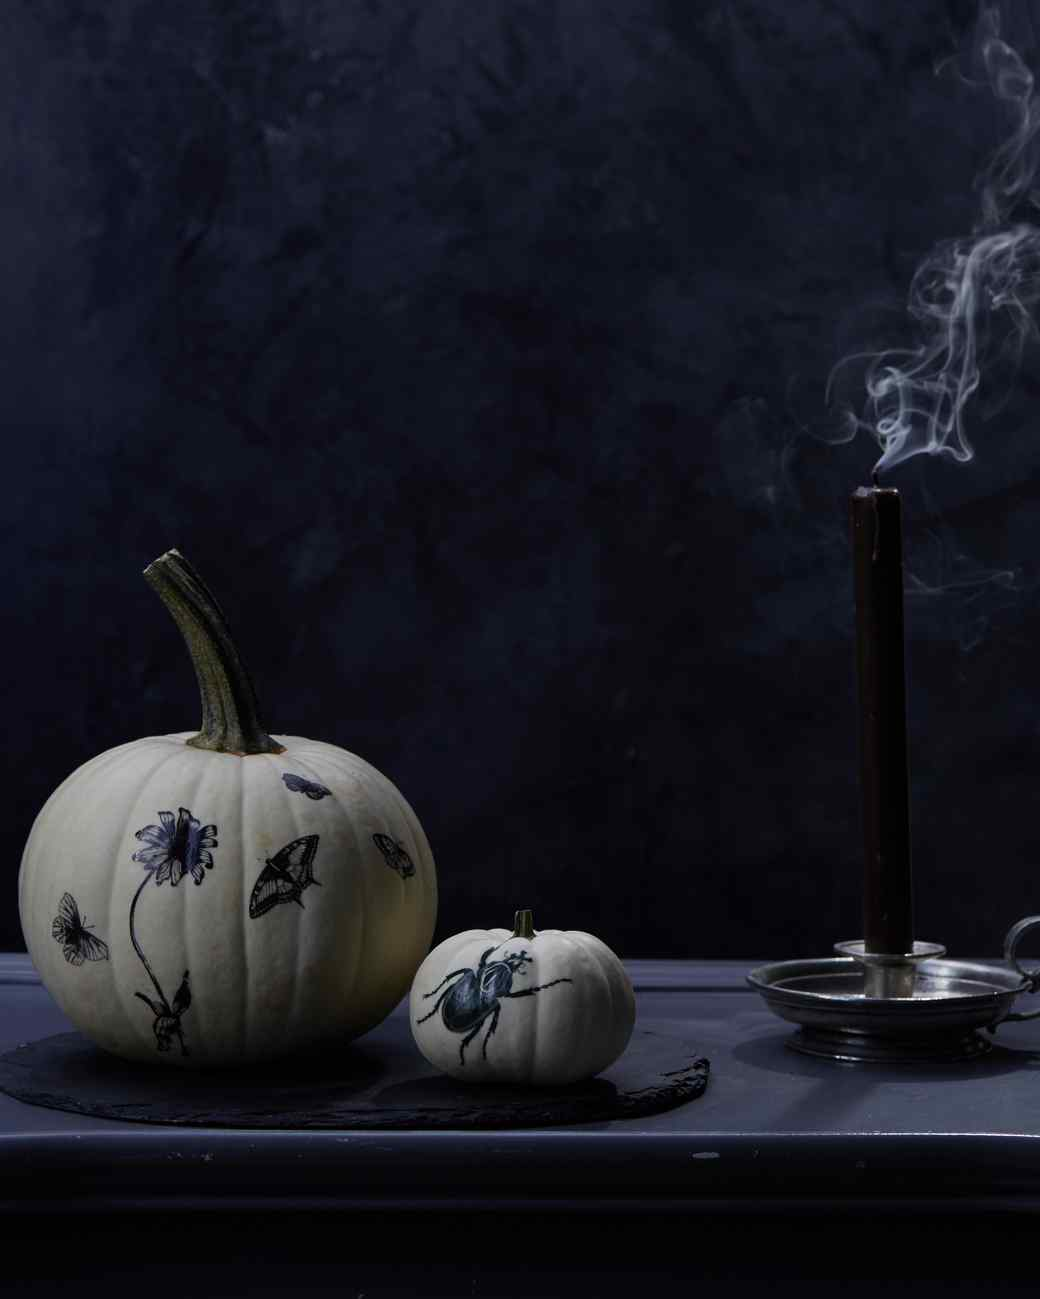 24b7f6516beec 13 Last-Minute Halloween Ideas | Martha Stewart